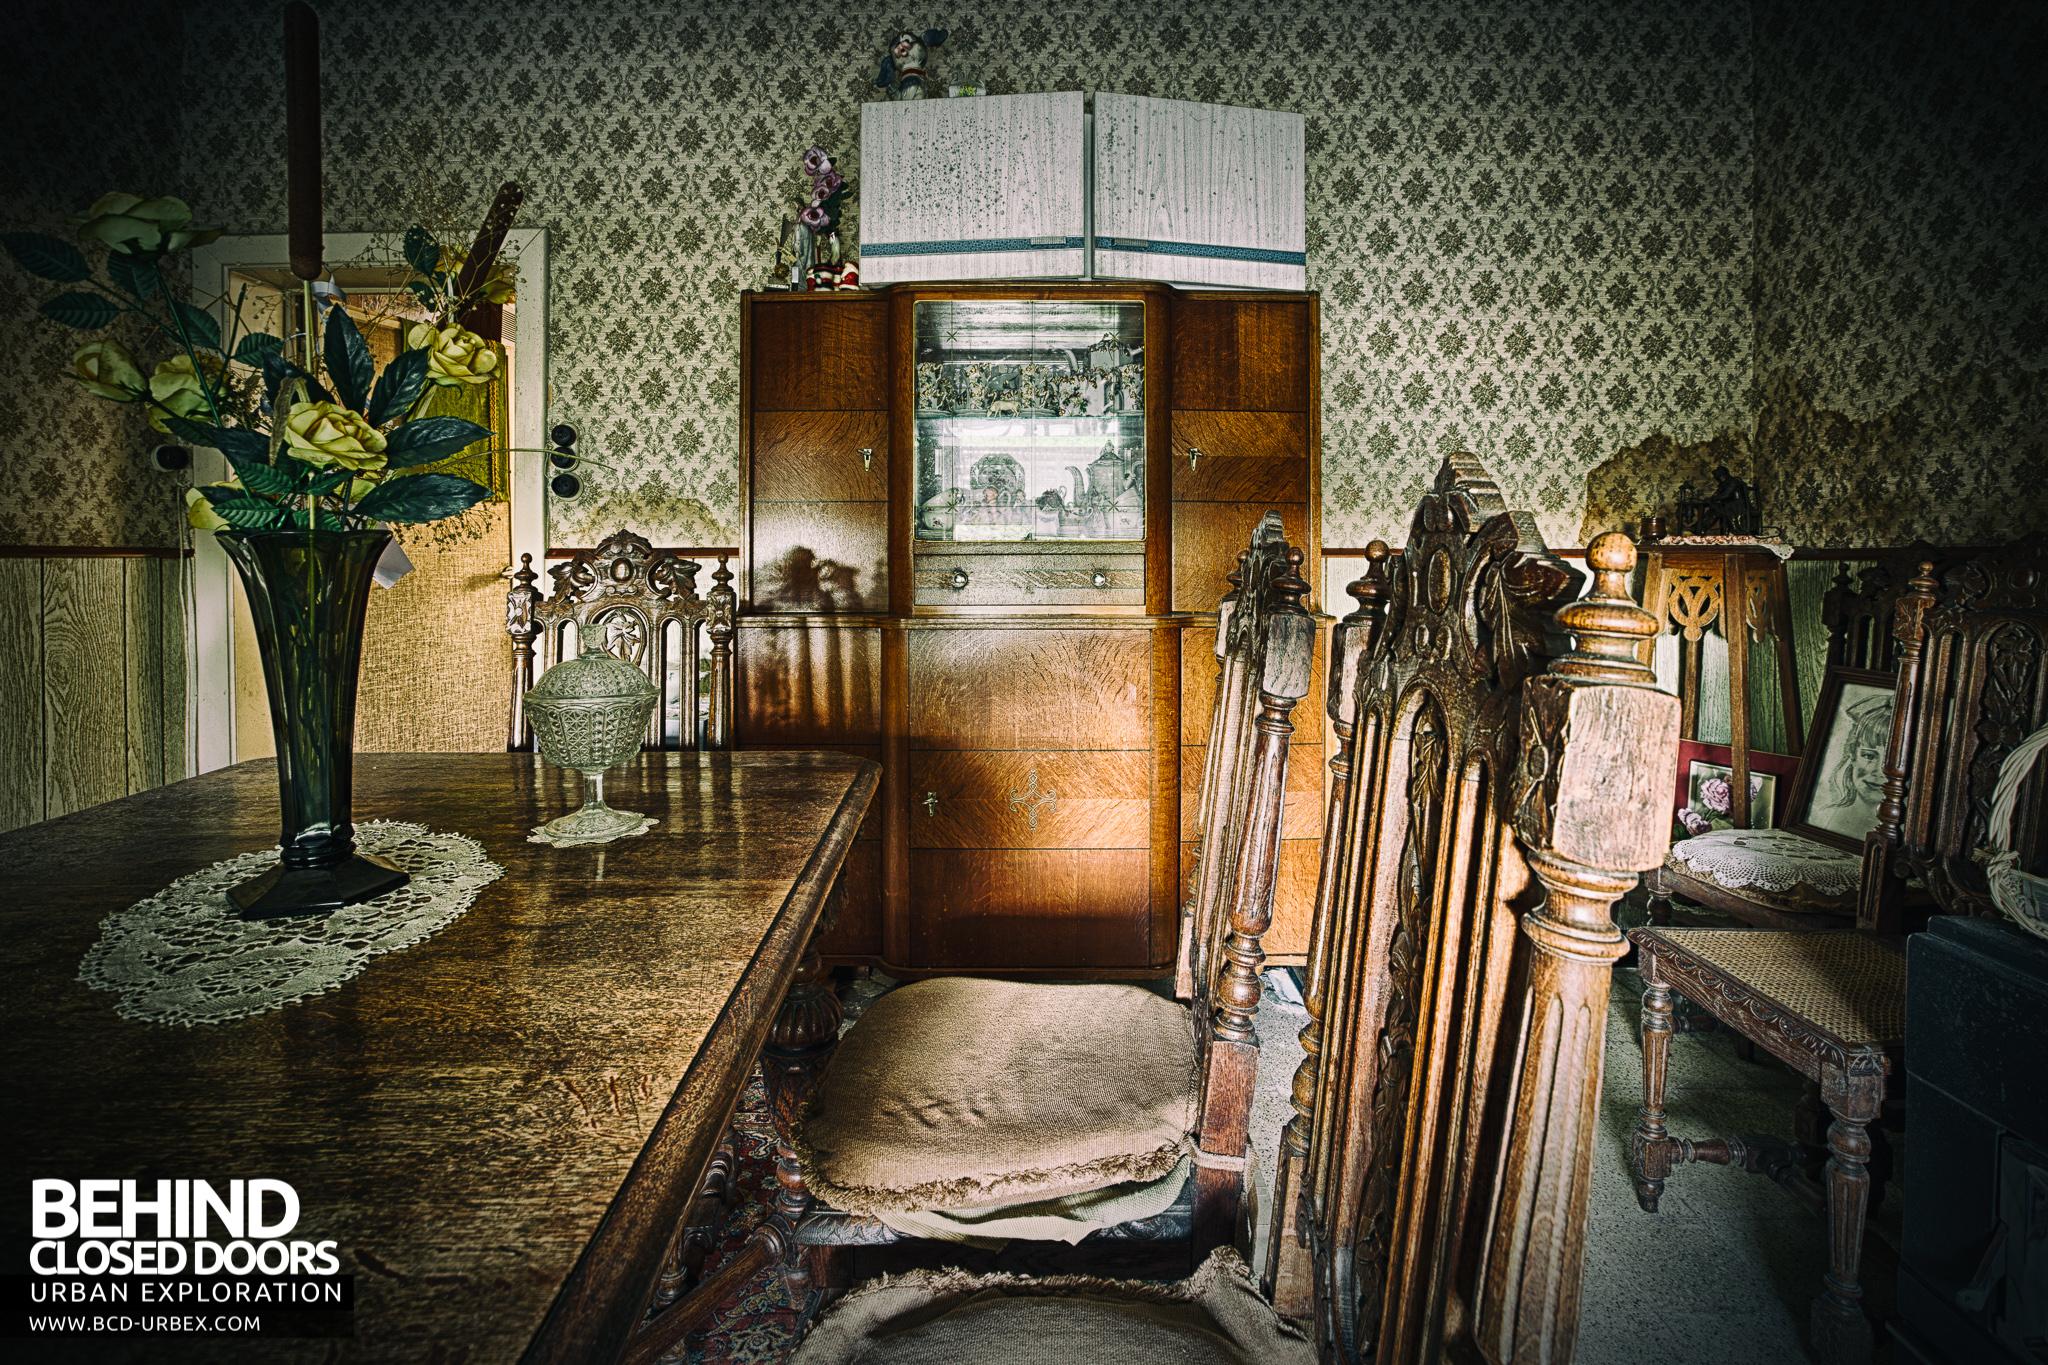 Maison Sweet Home Abandoned House Belgium 187 Urbex